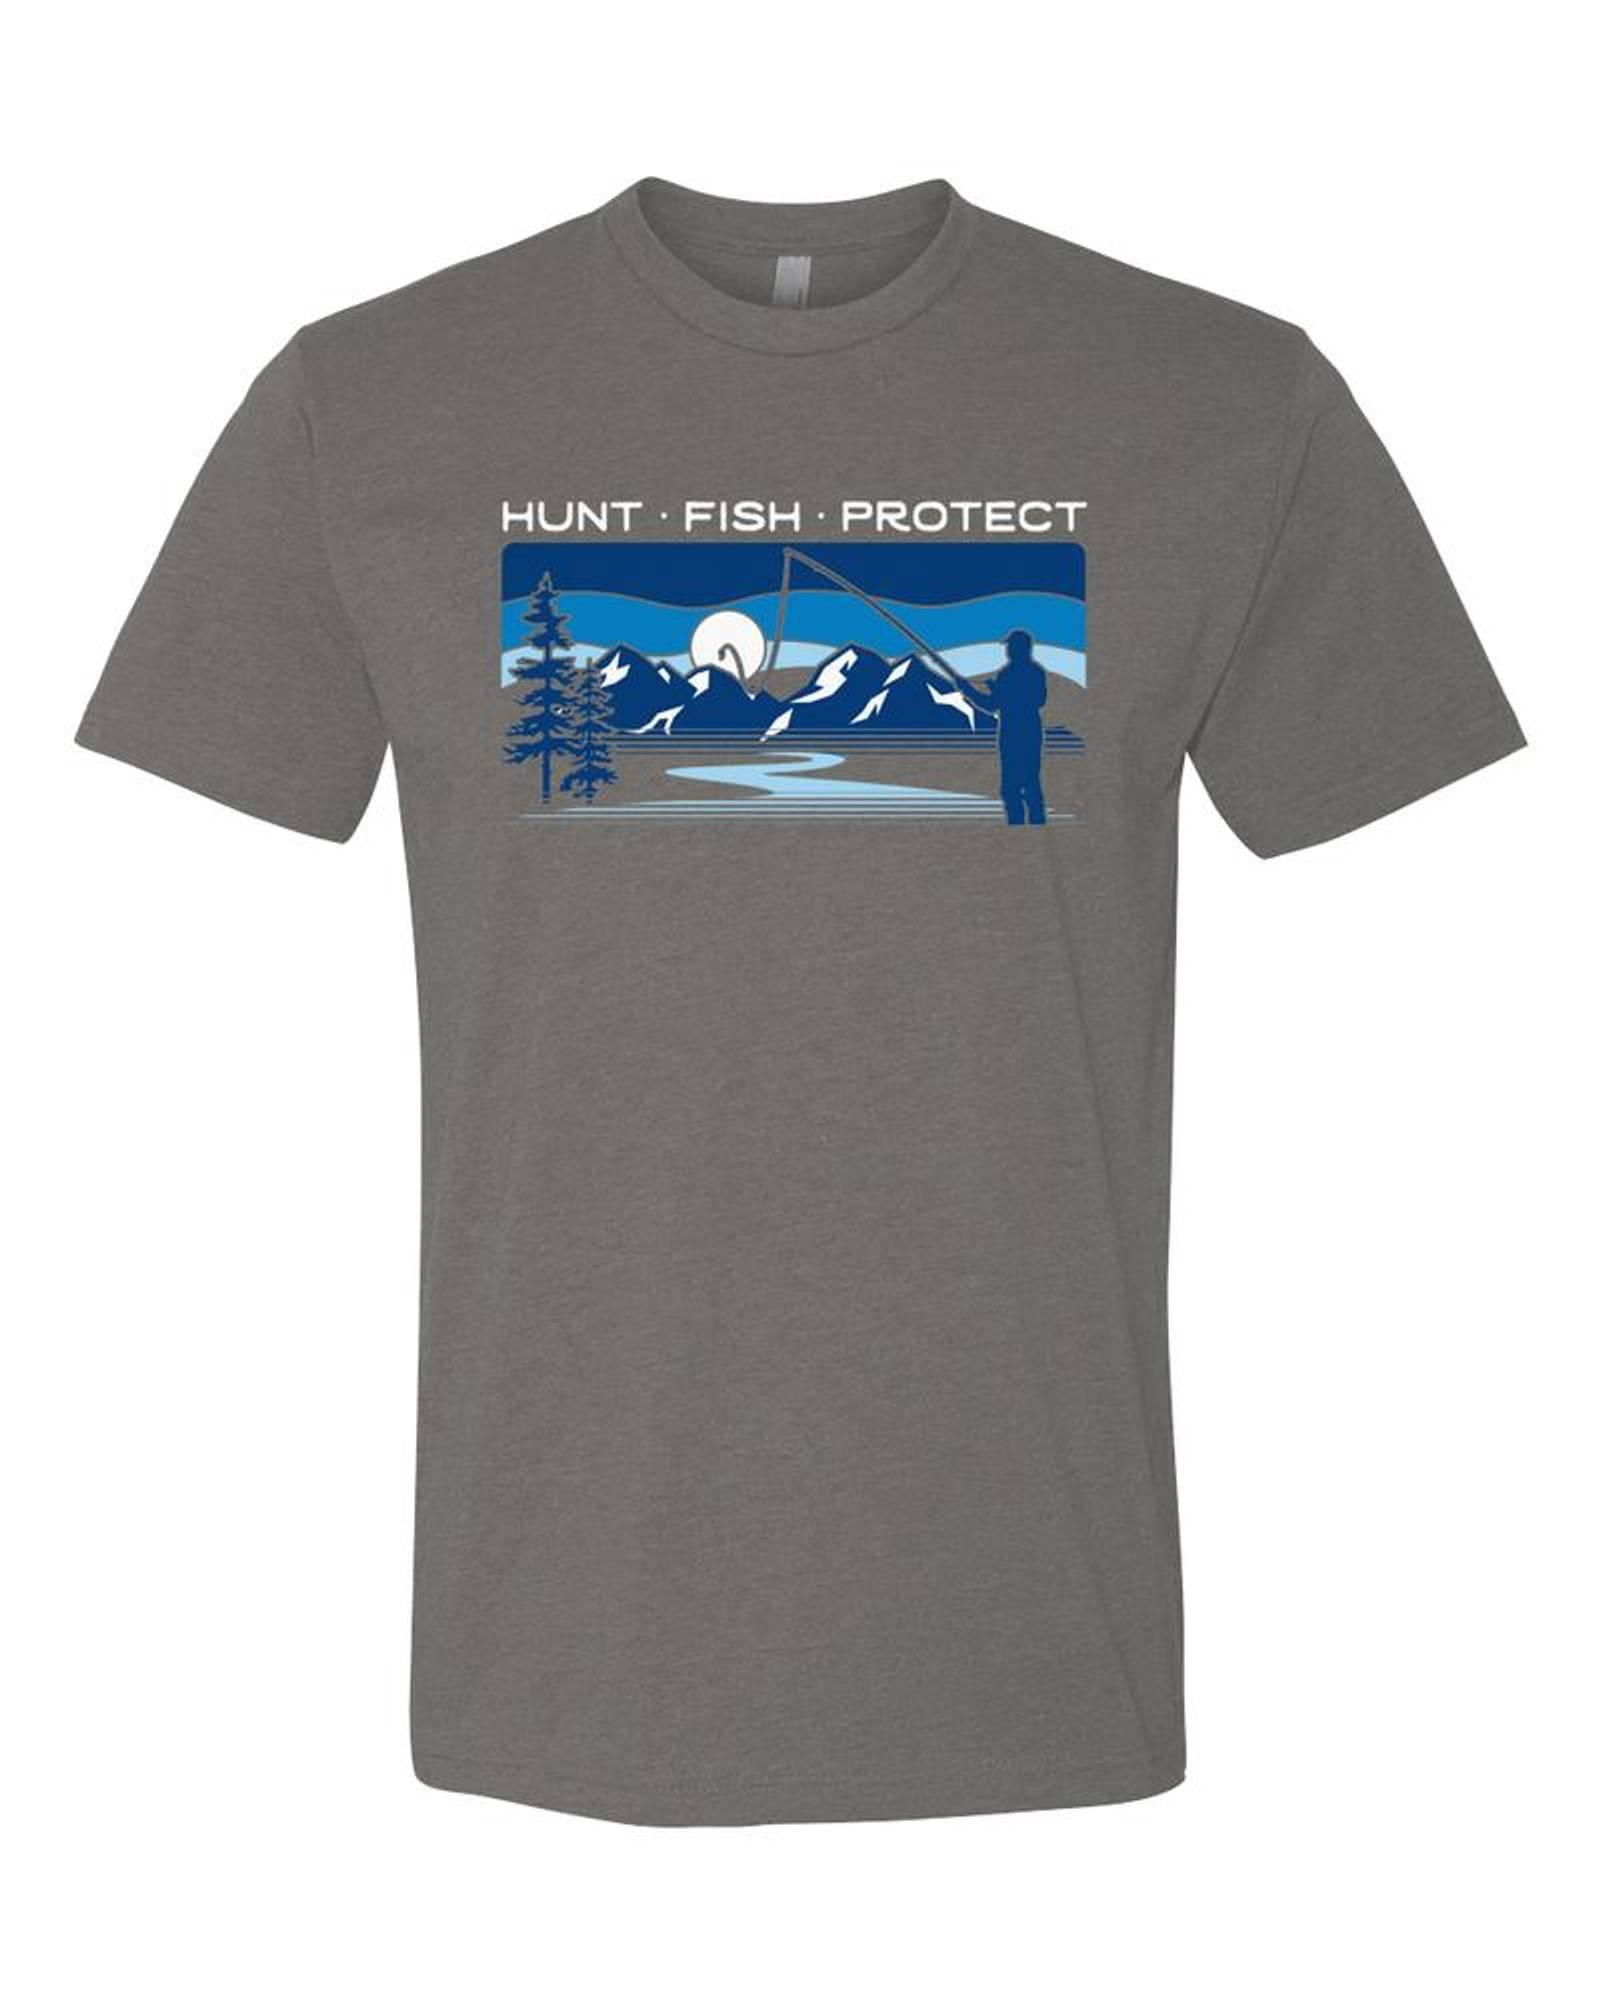 Stream Access: Hunt. Fish. Protect